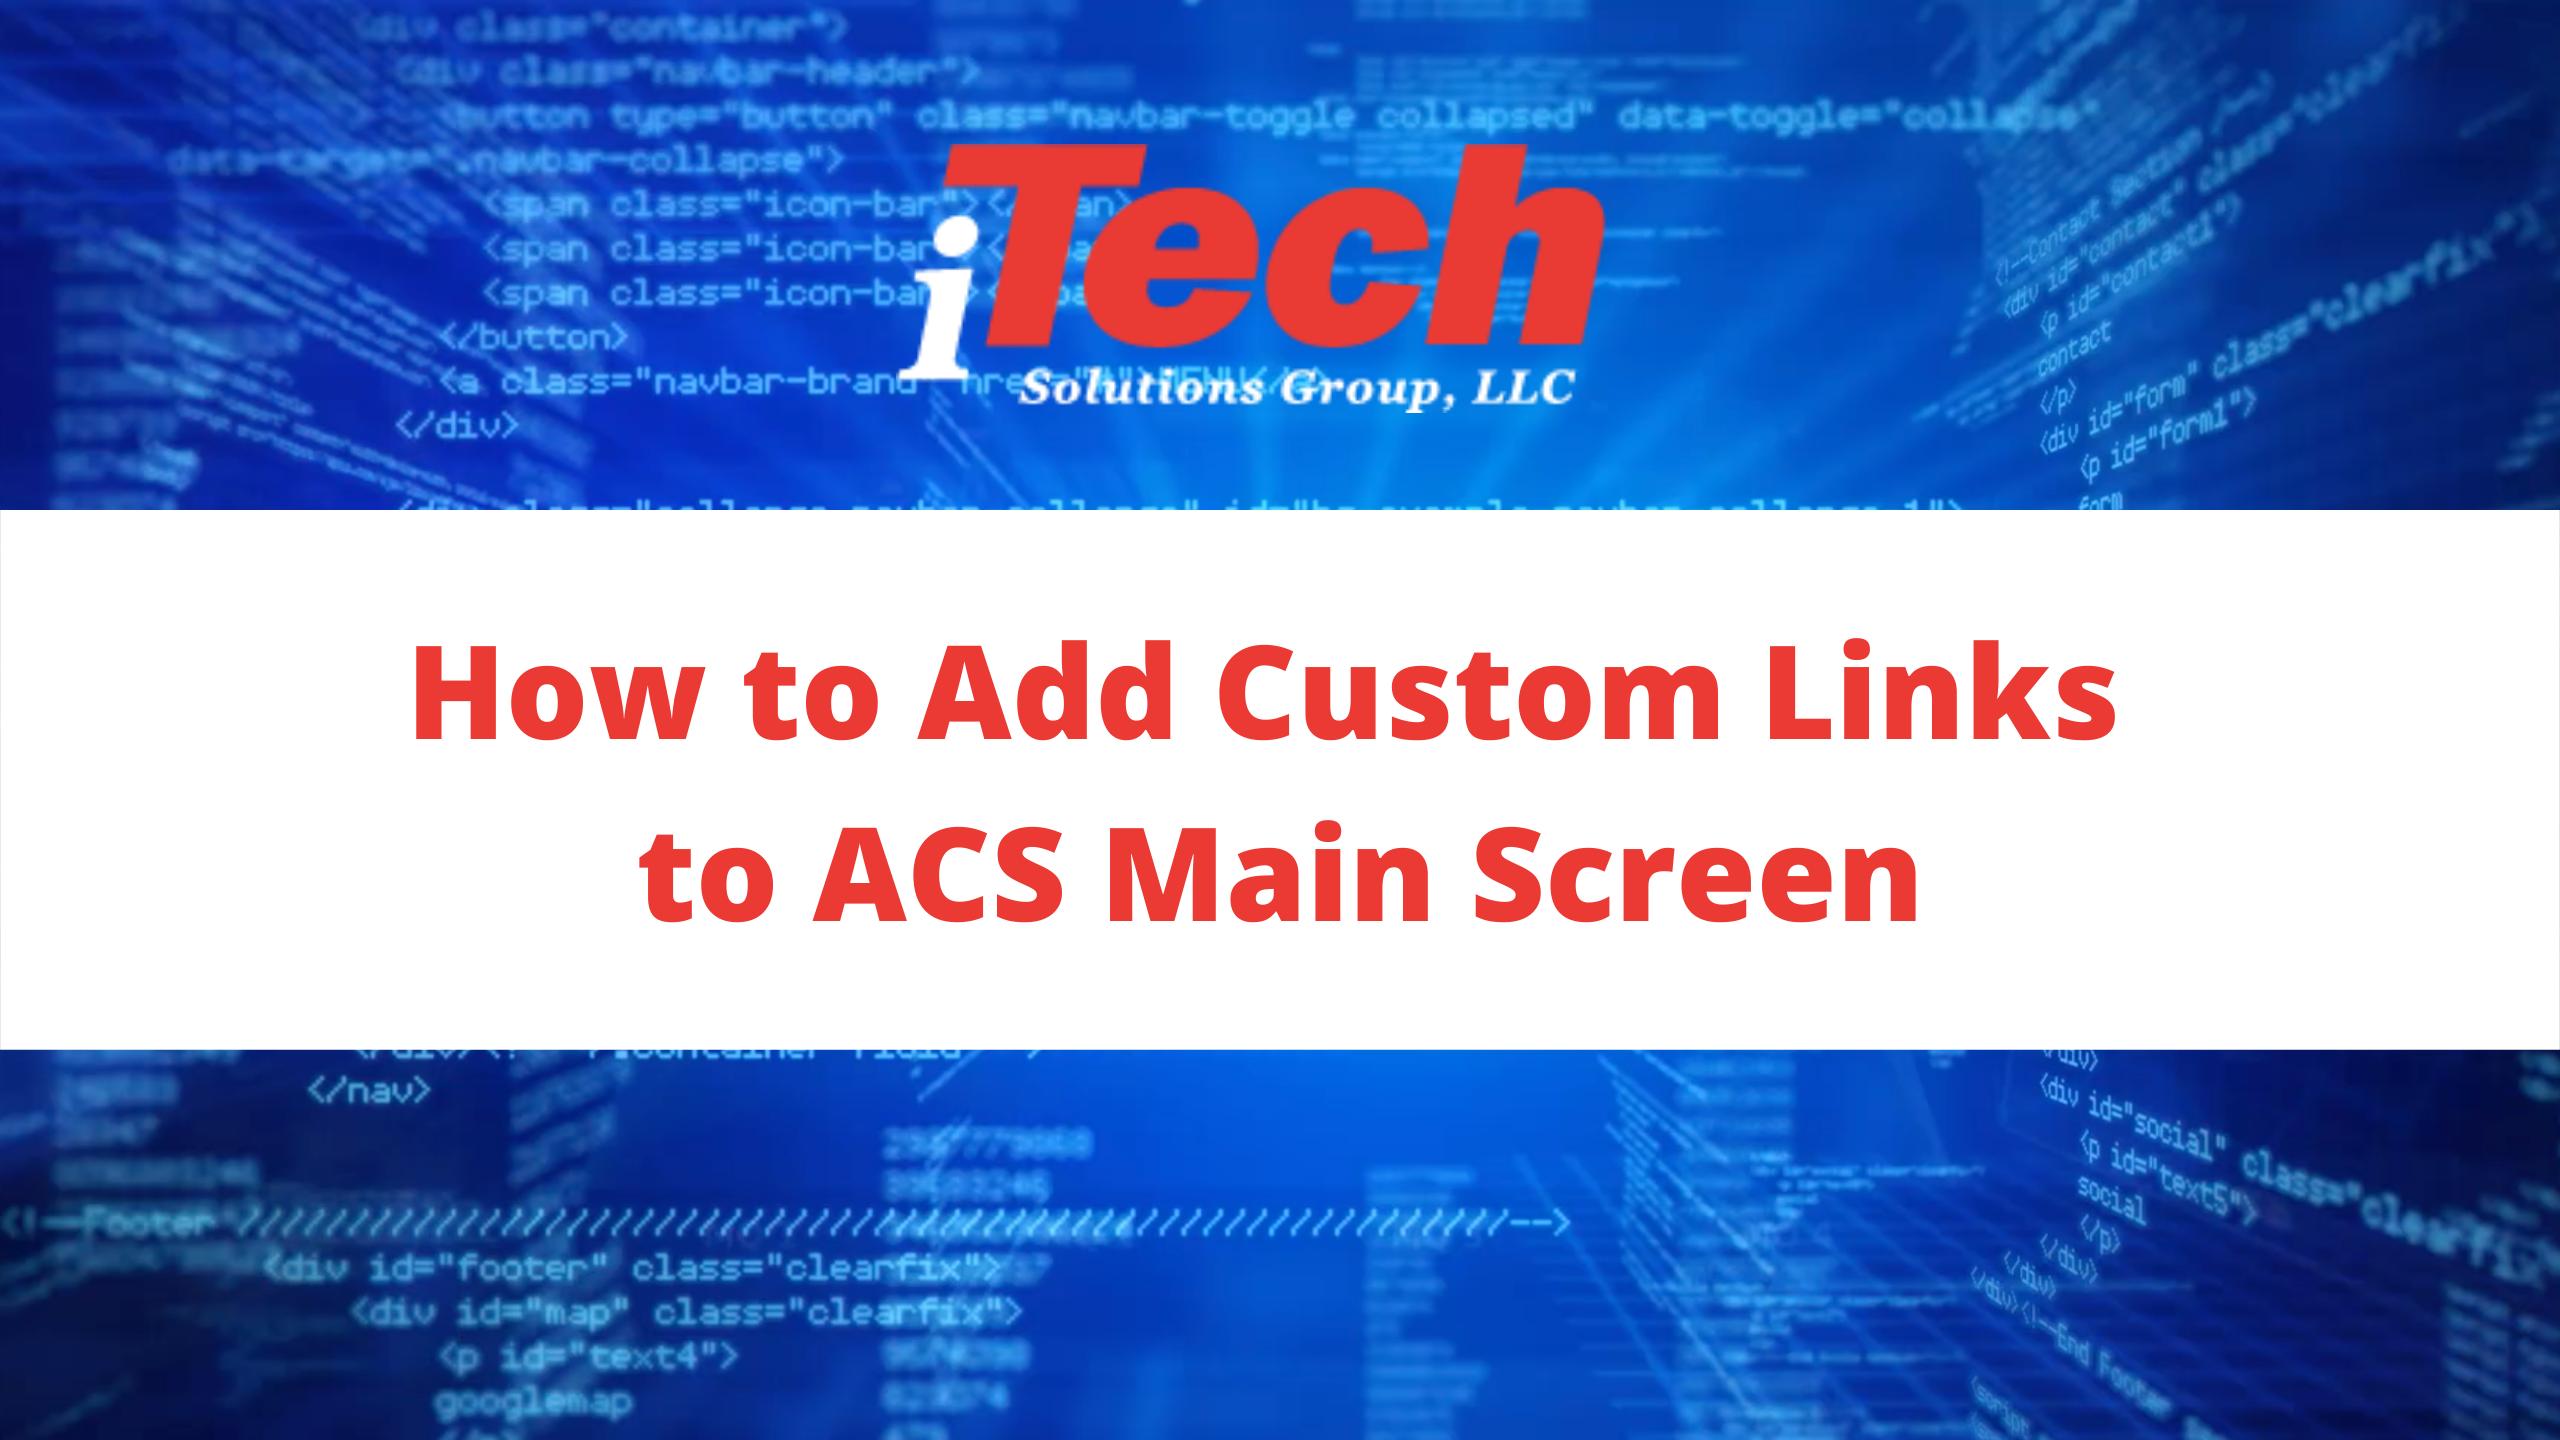 How to Add Custom Links to ACS Main Screen